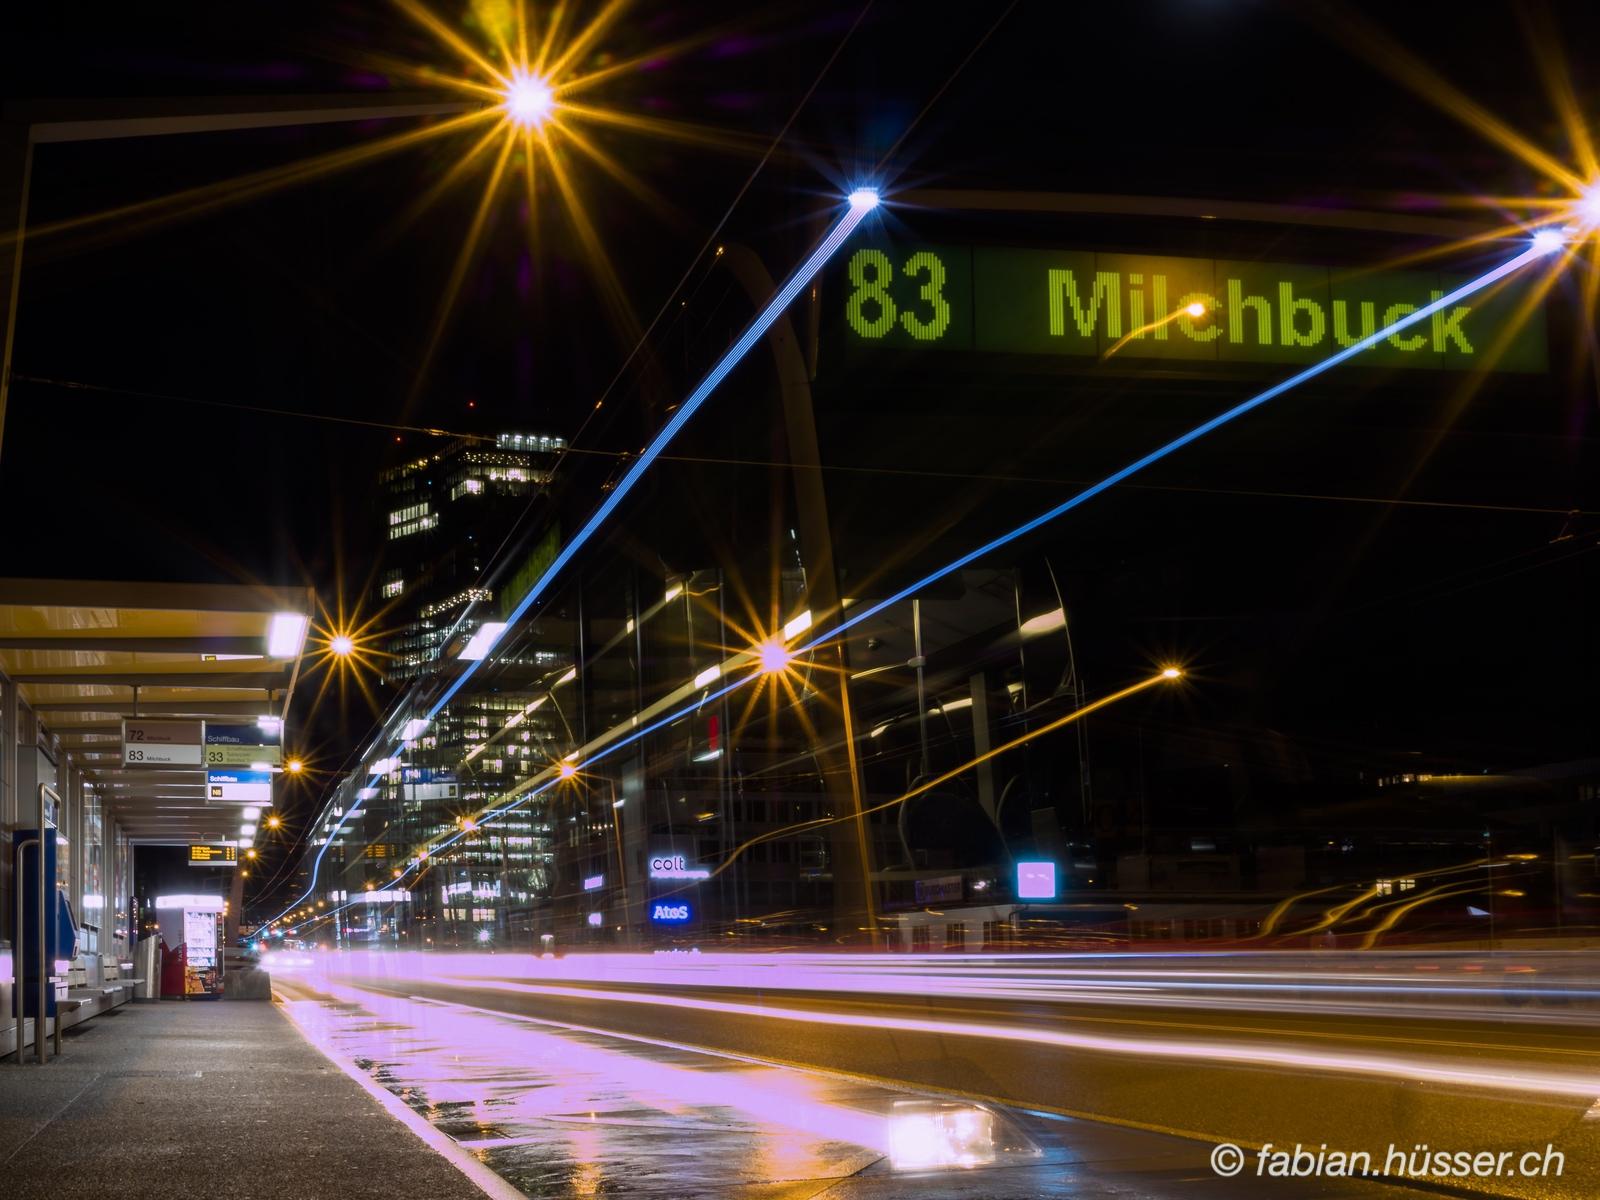 Milchbuck